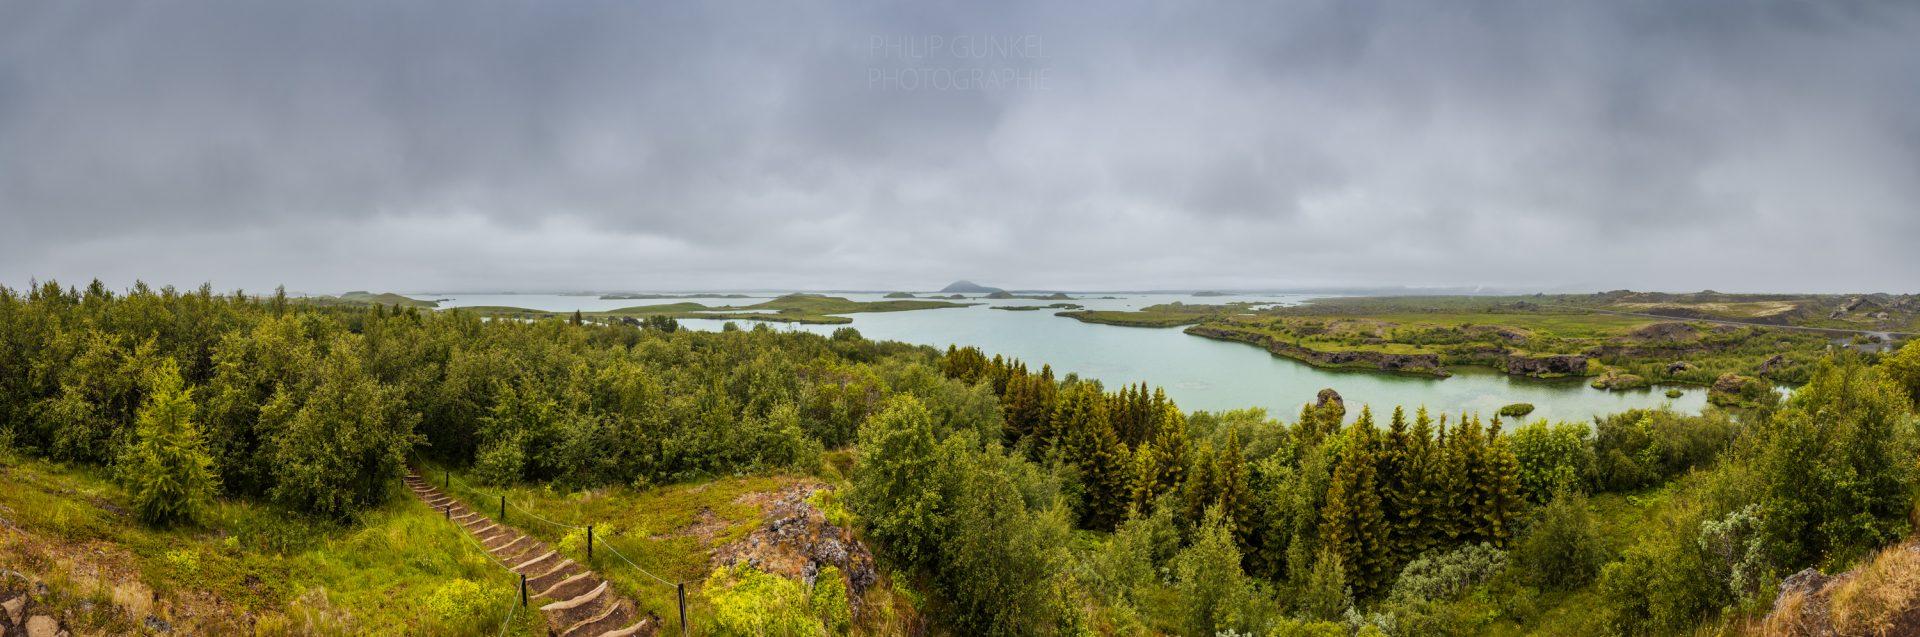 Untitled_Panorama132